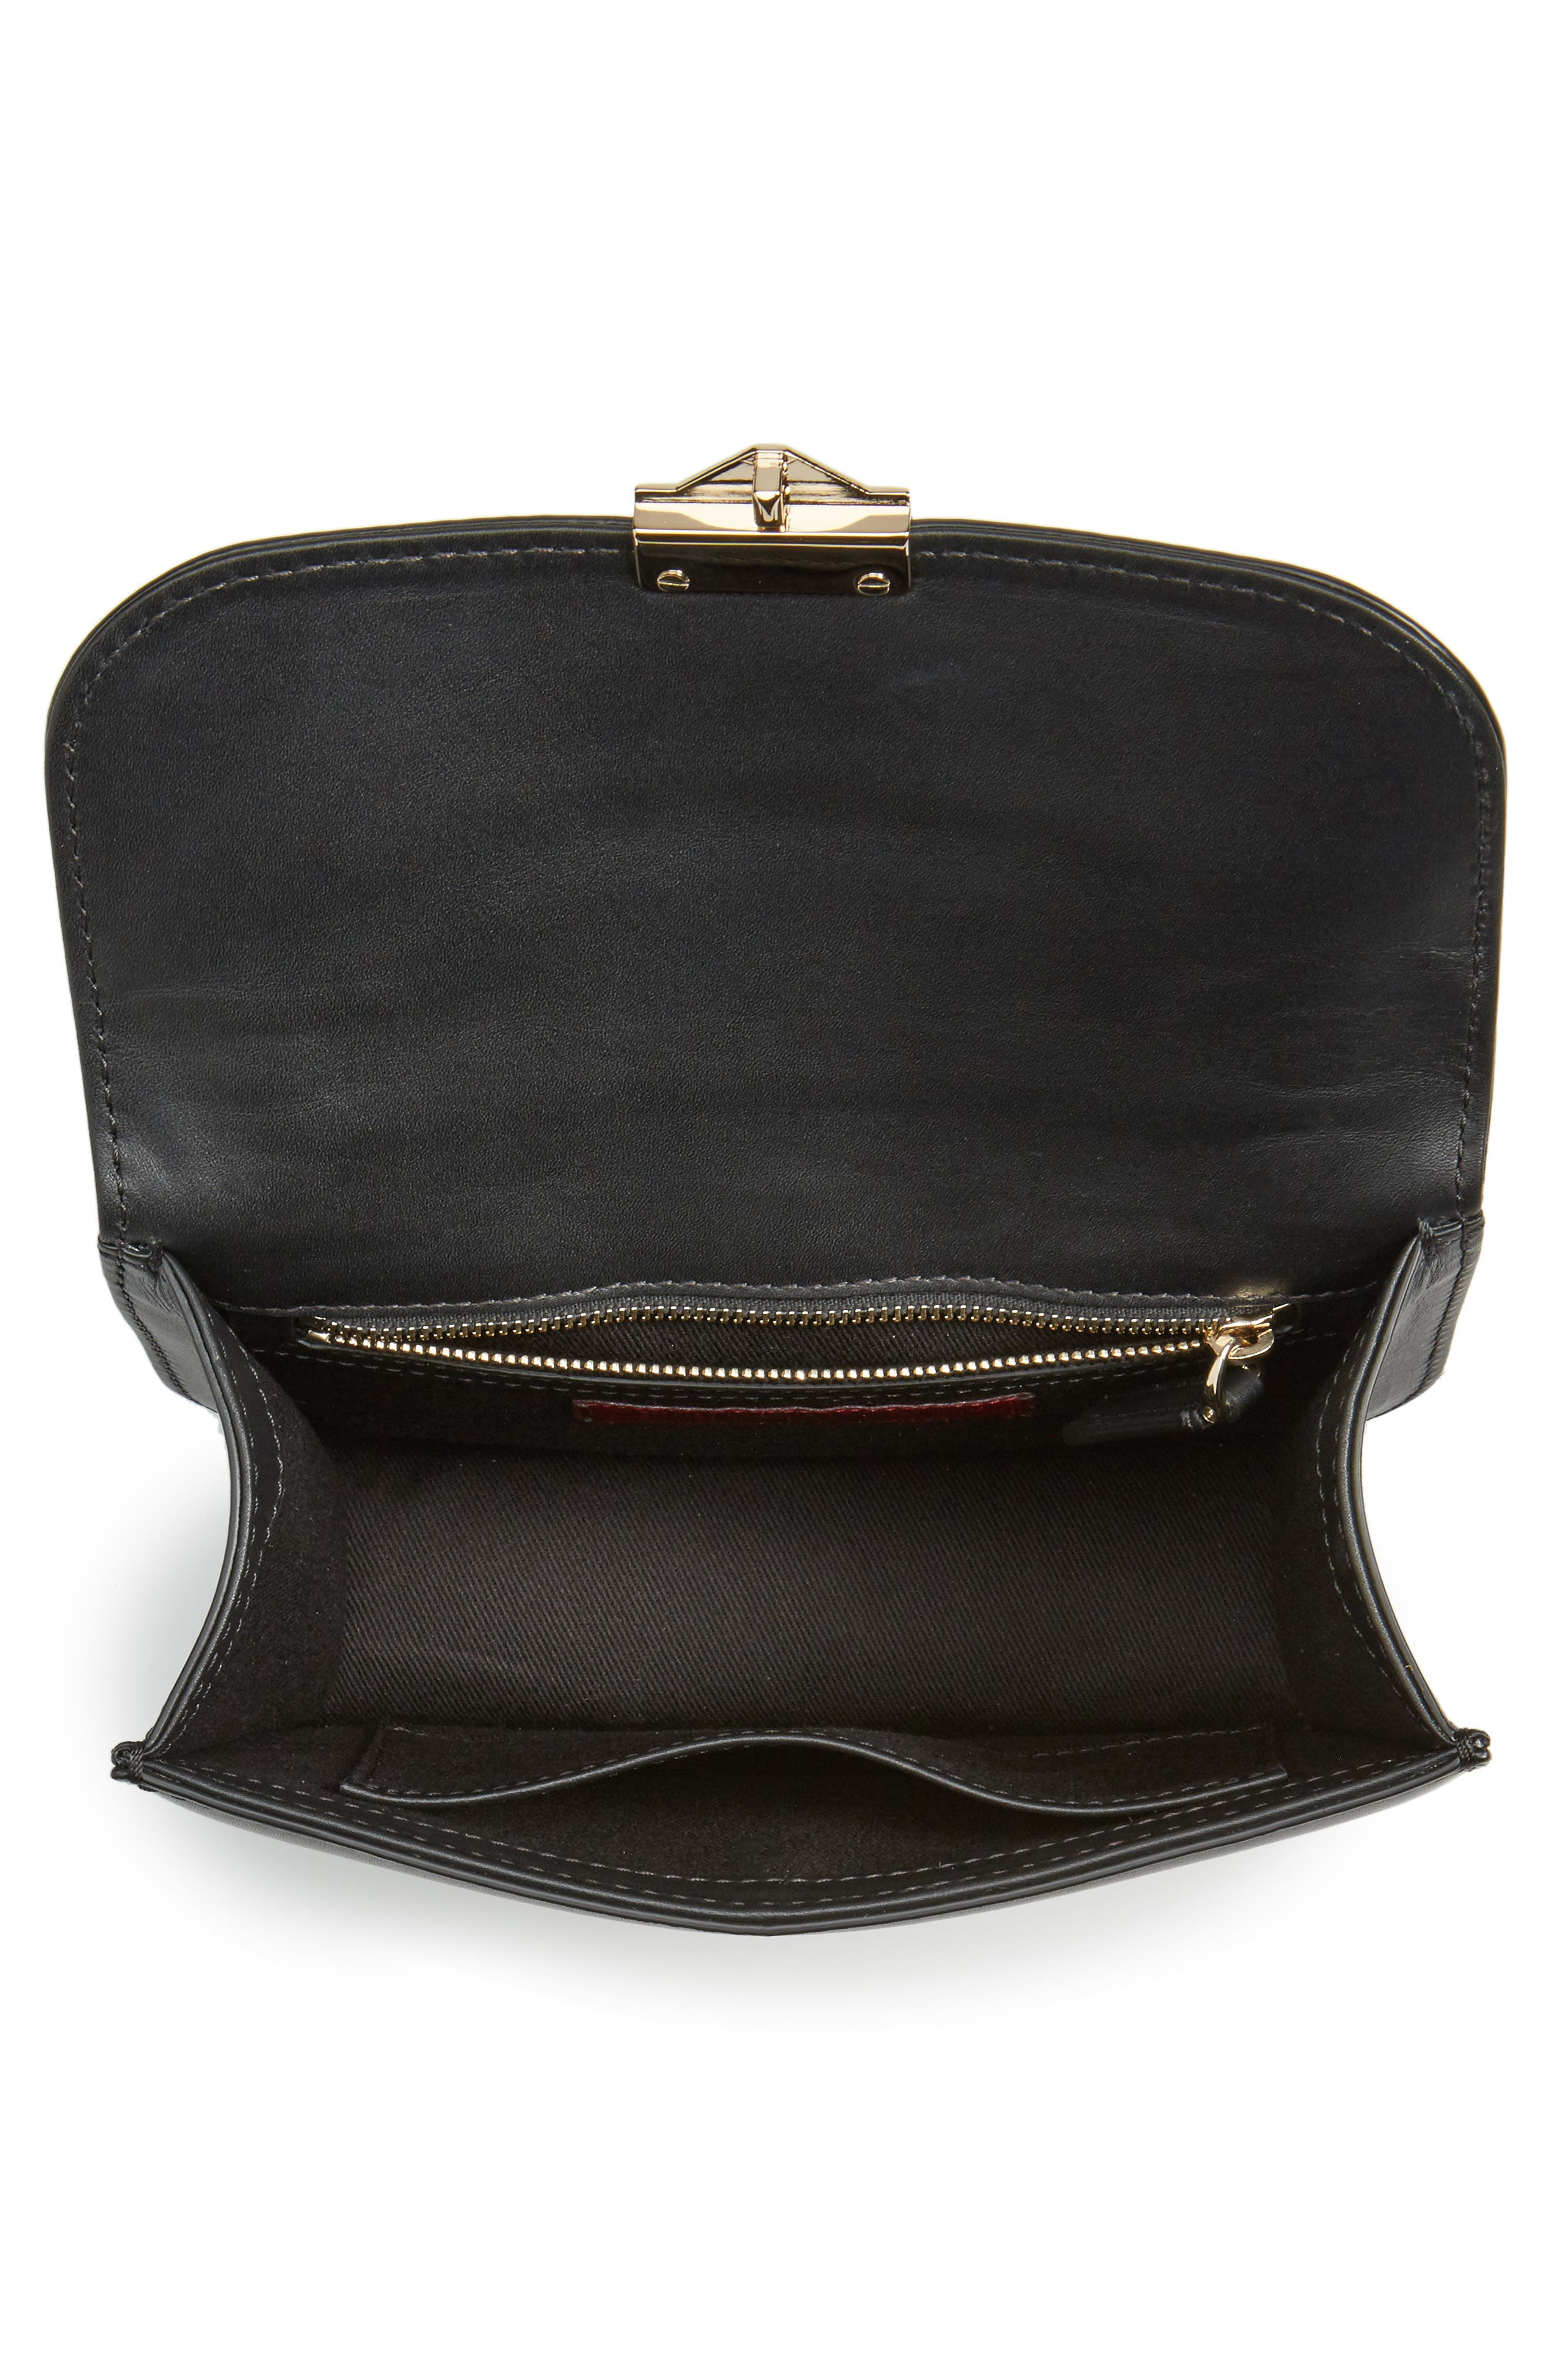 Small Lock Leather Crossbody Bag,                             Alternate thumbnail 4, color,                             NERO